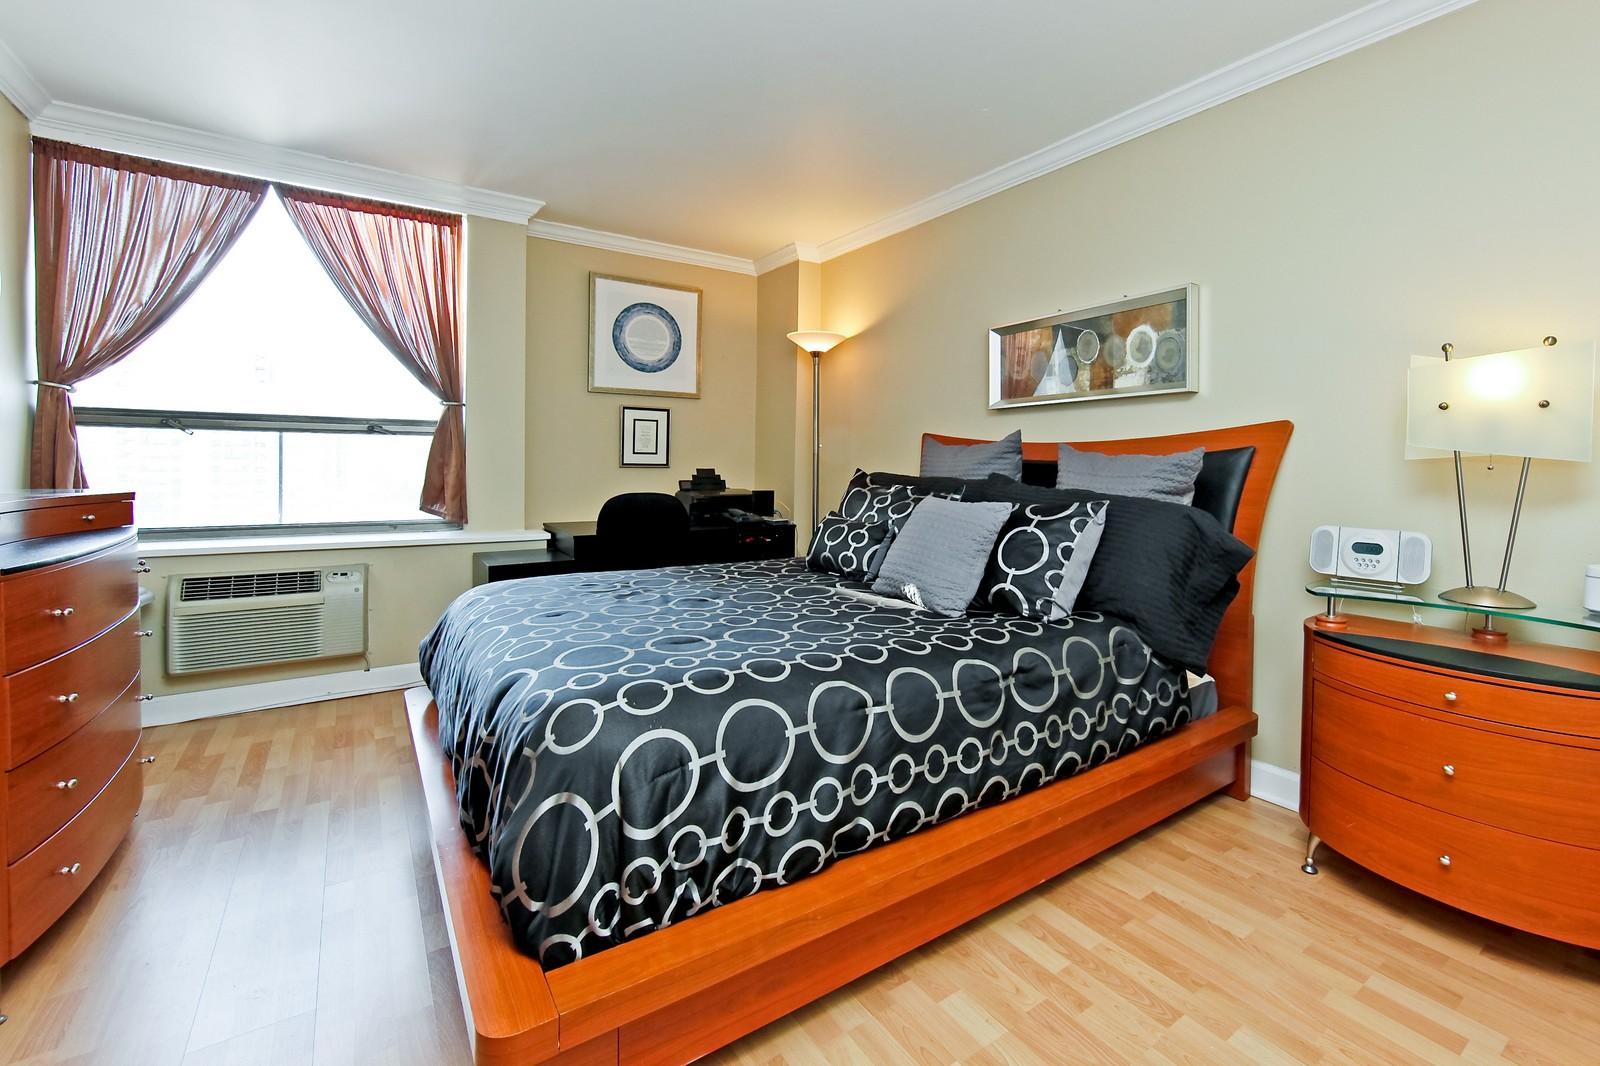 Real Estate Photography - 1360 Sandburg, 2103, Chicago, IL, 60610 - Location 1